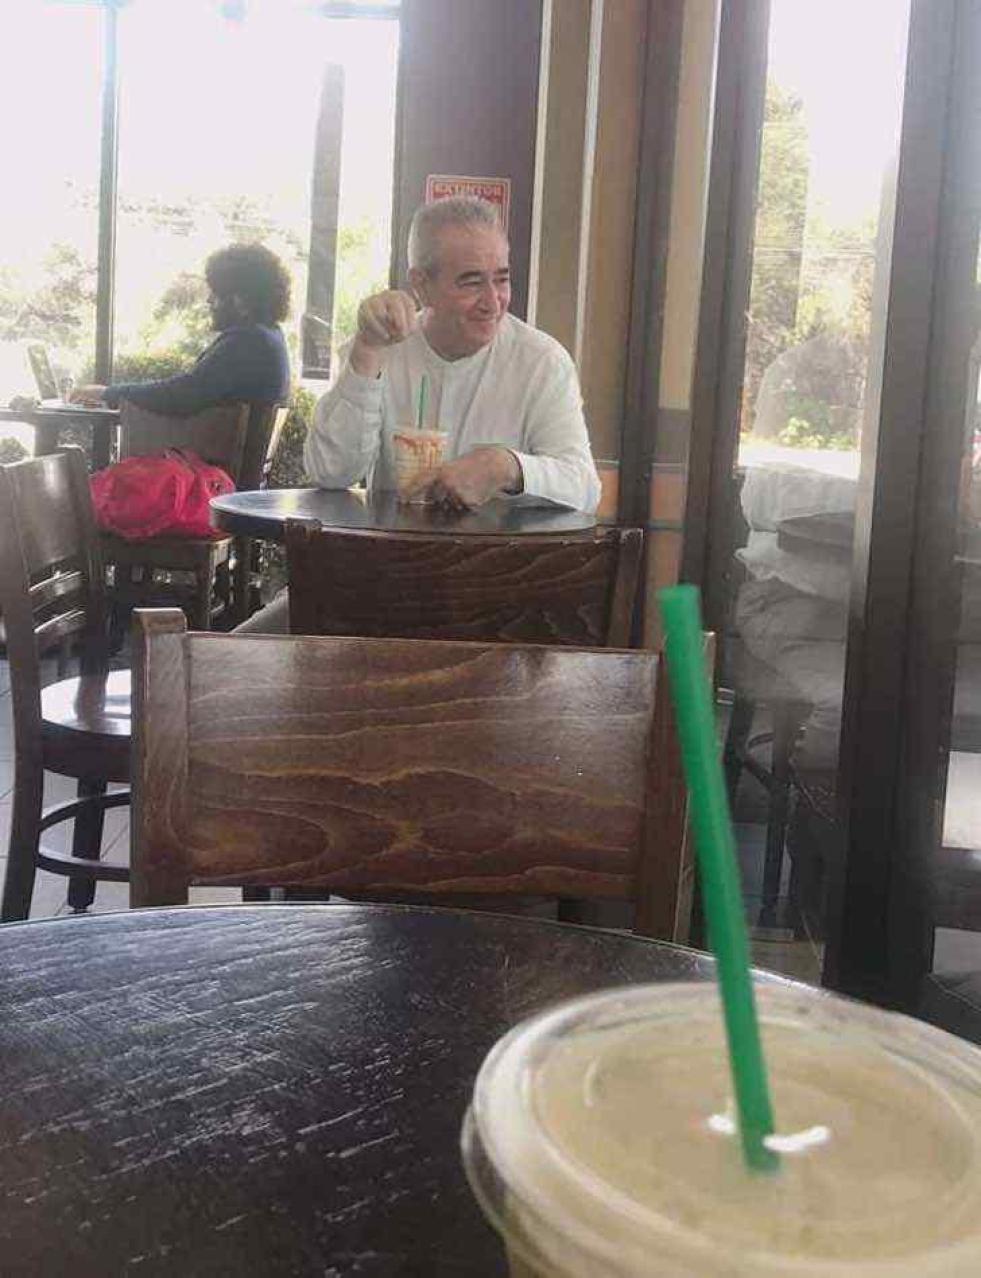 Un padre acompañó a su hija a una cita de Tinder para vigilarla | #LaDos